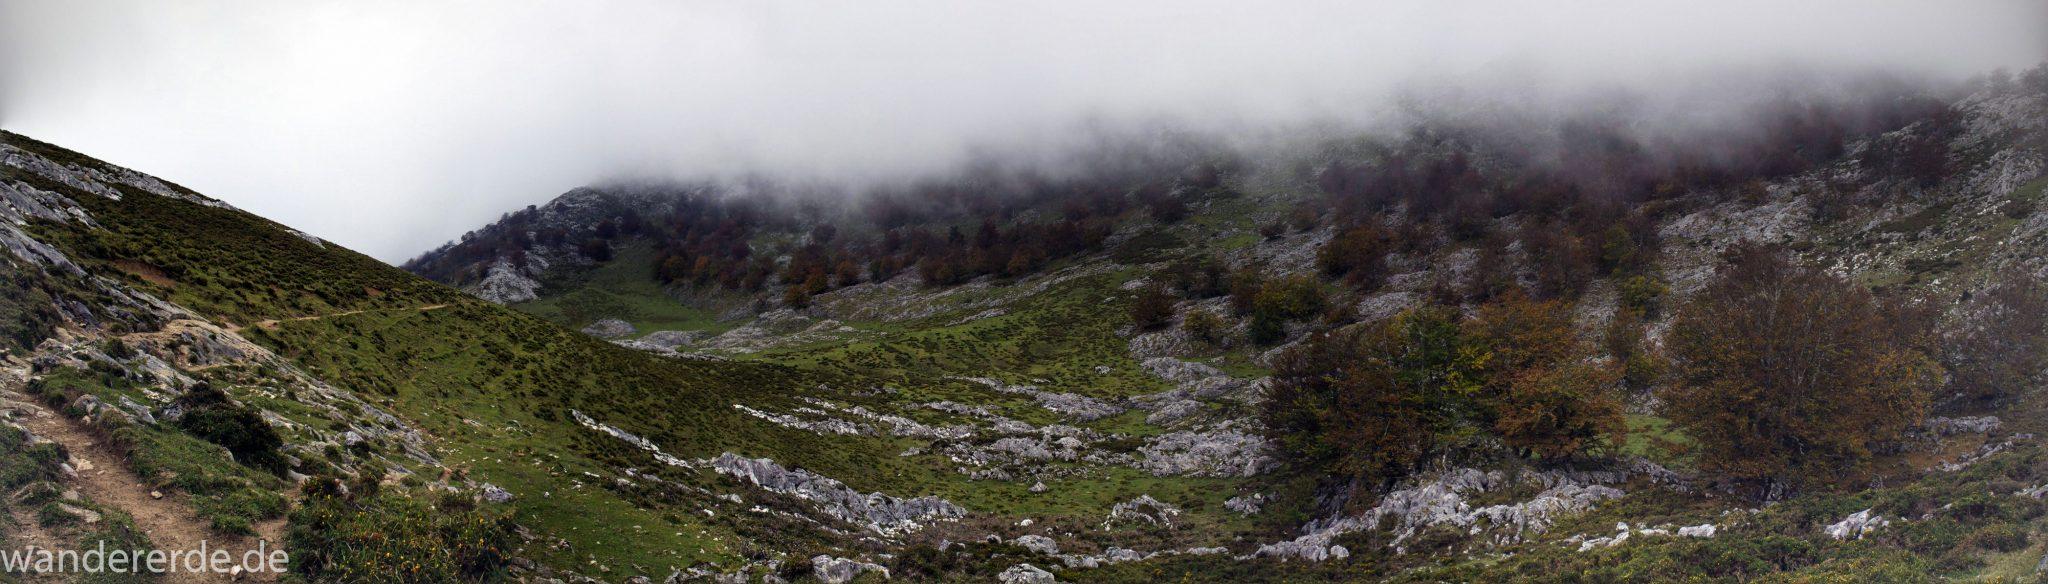 Wanderung Vega de Ario Picos de Europa Spanien, Berge, Wolken, grüne Wiese, zerklüftete Felsen, Bergregion, schmaler Wanderpfad, viele Bäume, Wanderregion Nordspanien